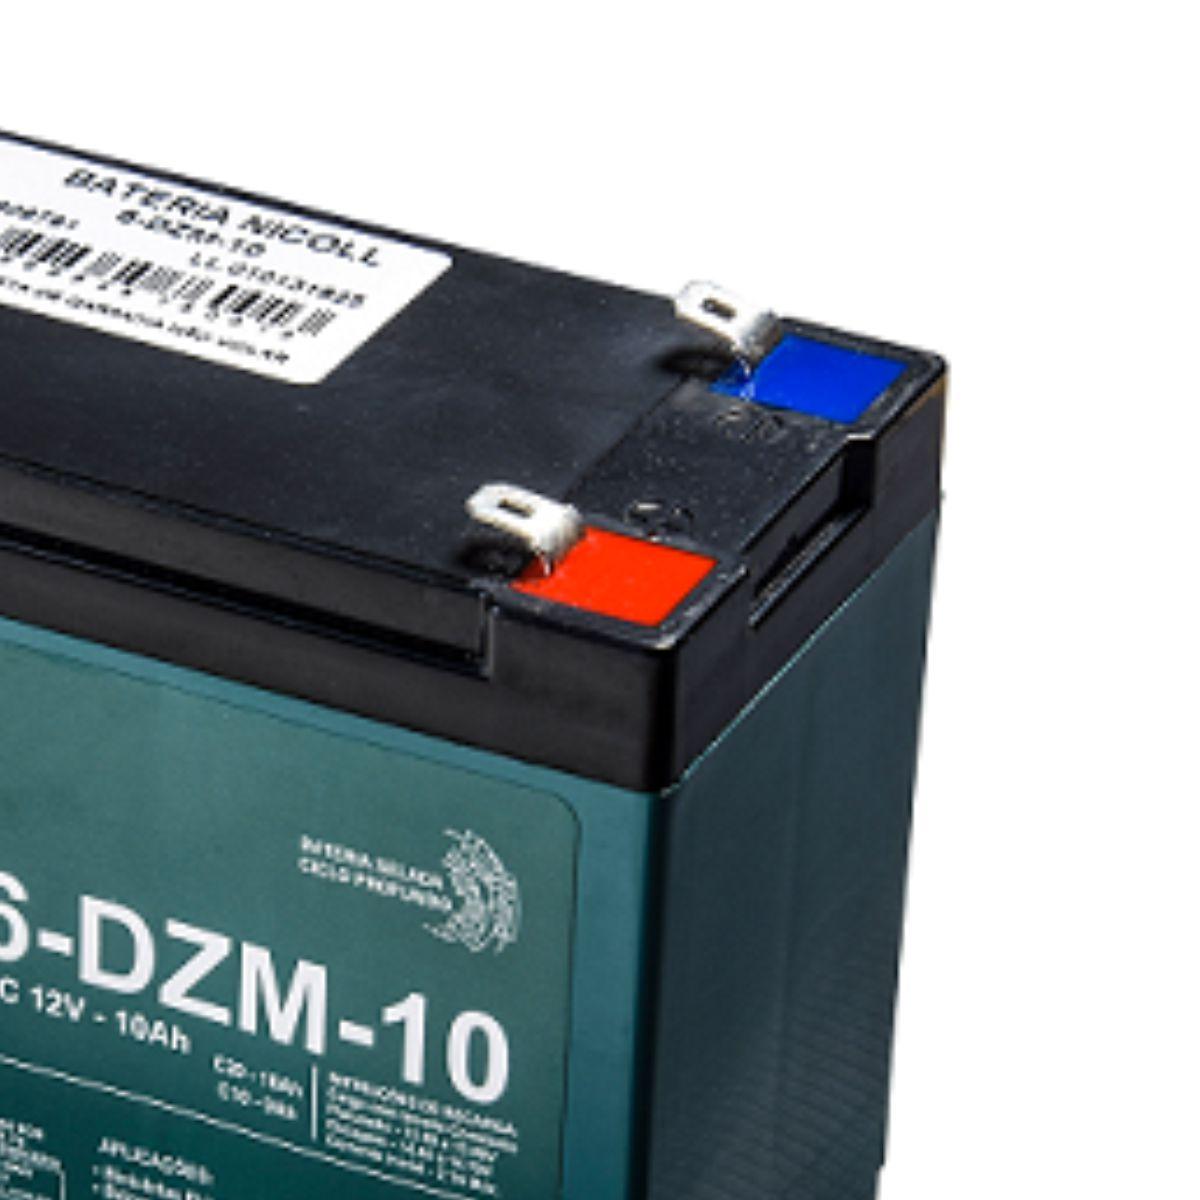 Bateria de Chumbo Ácido, Nicoll, VRLA, EV-12v 10ah